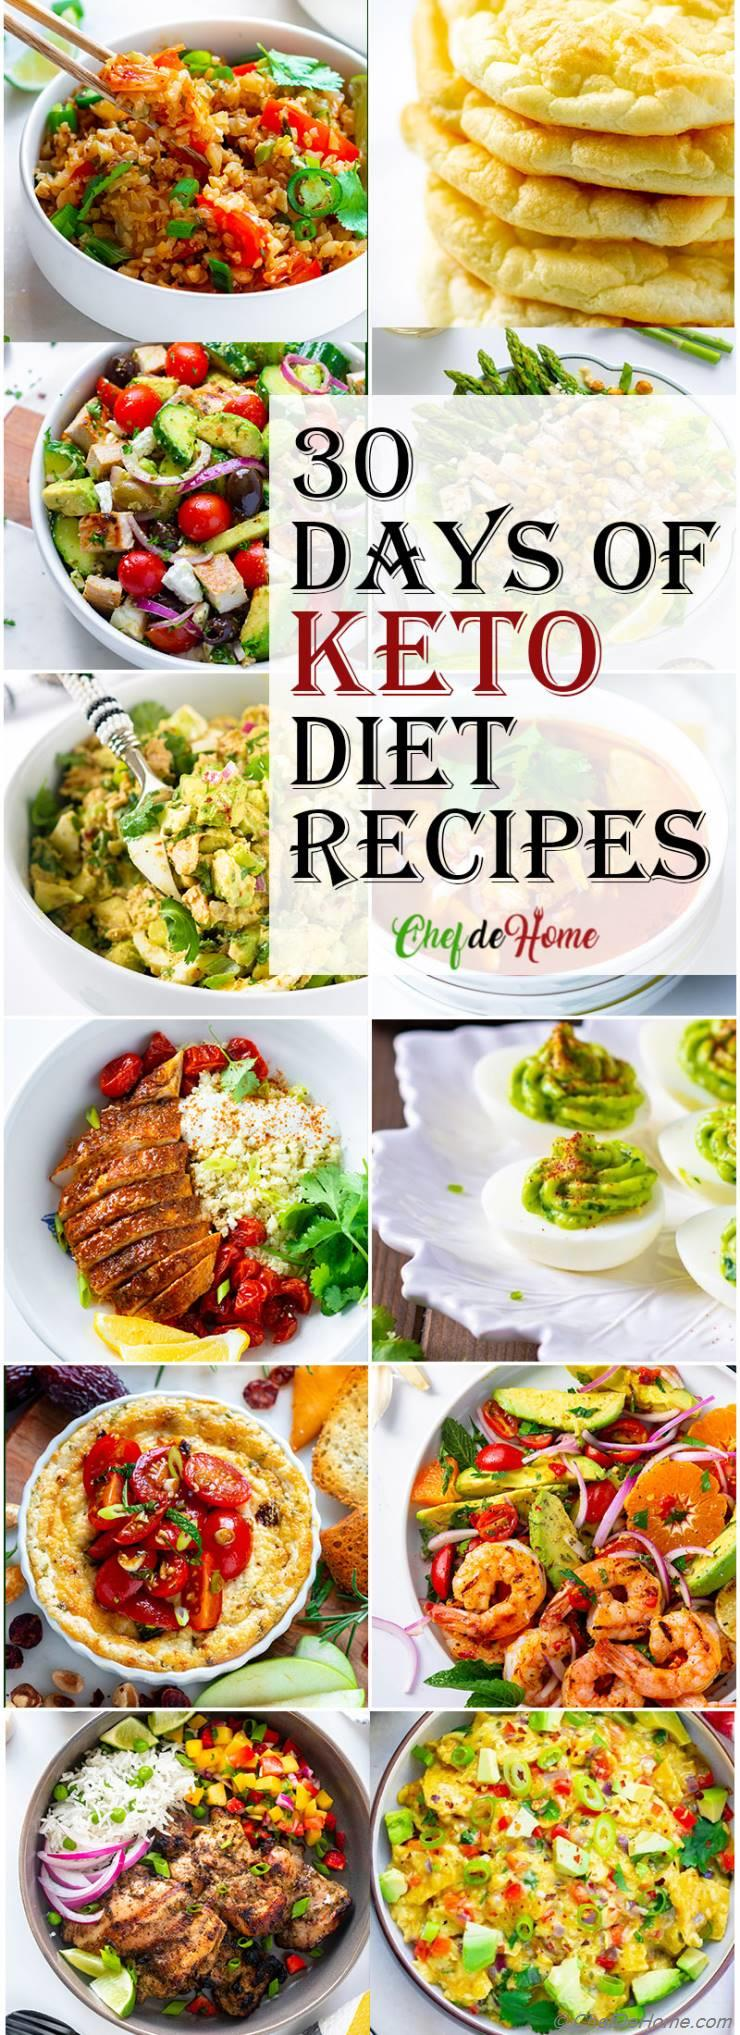 30 Days of Keto Diet